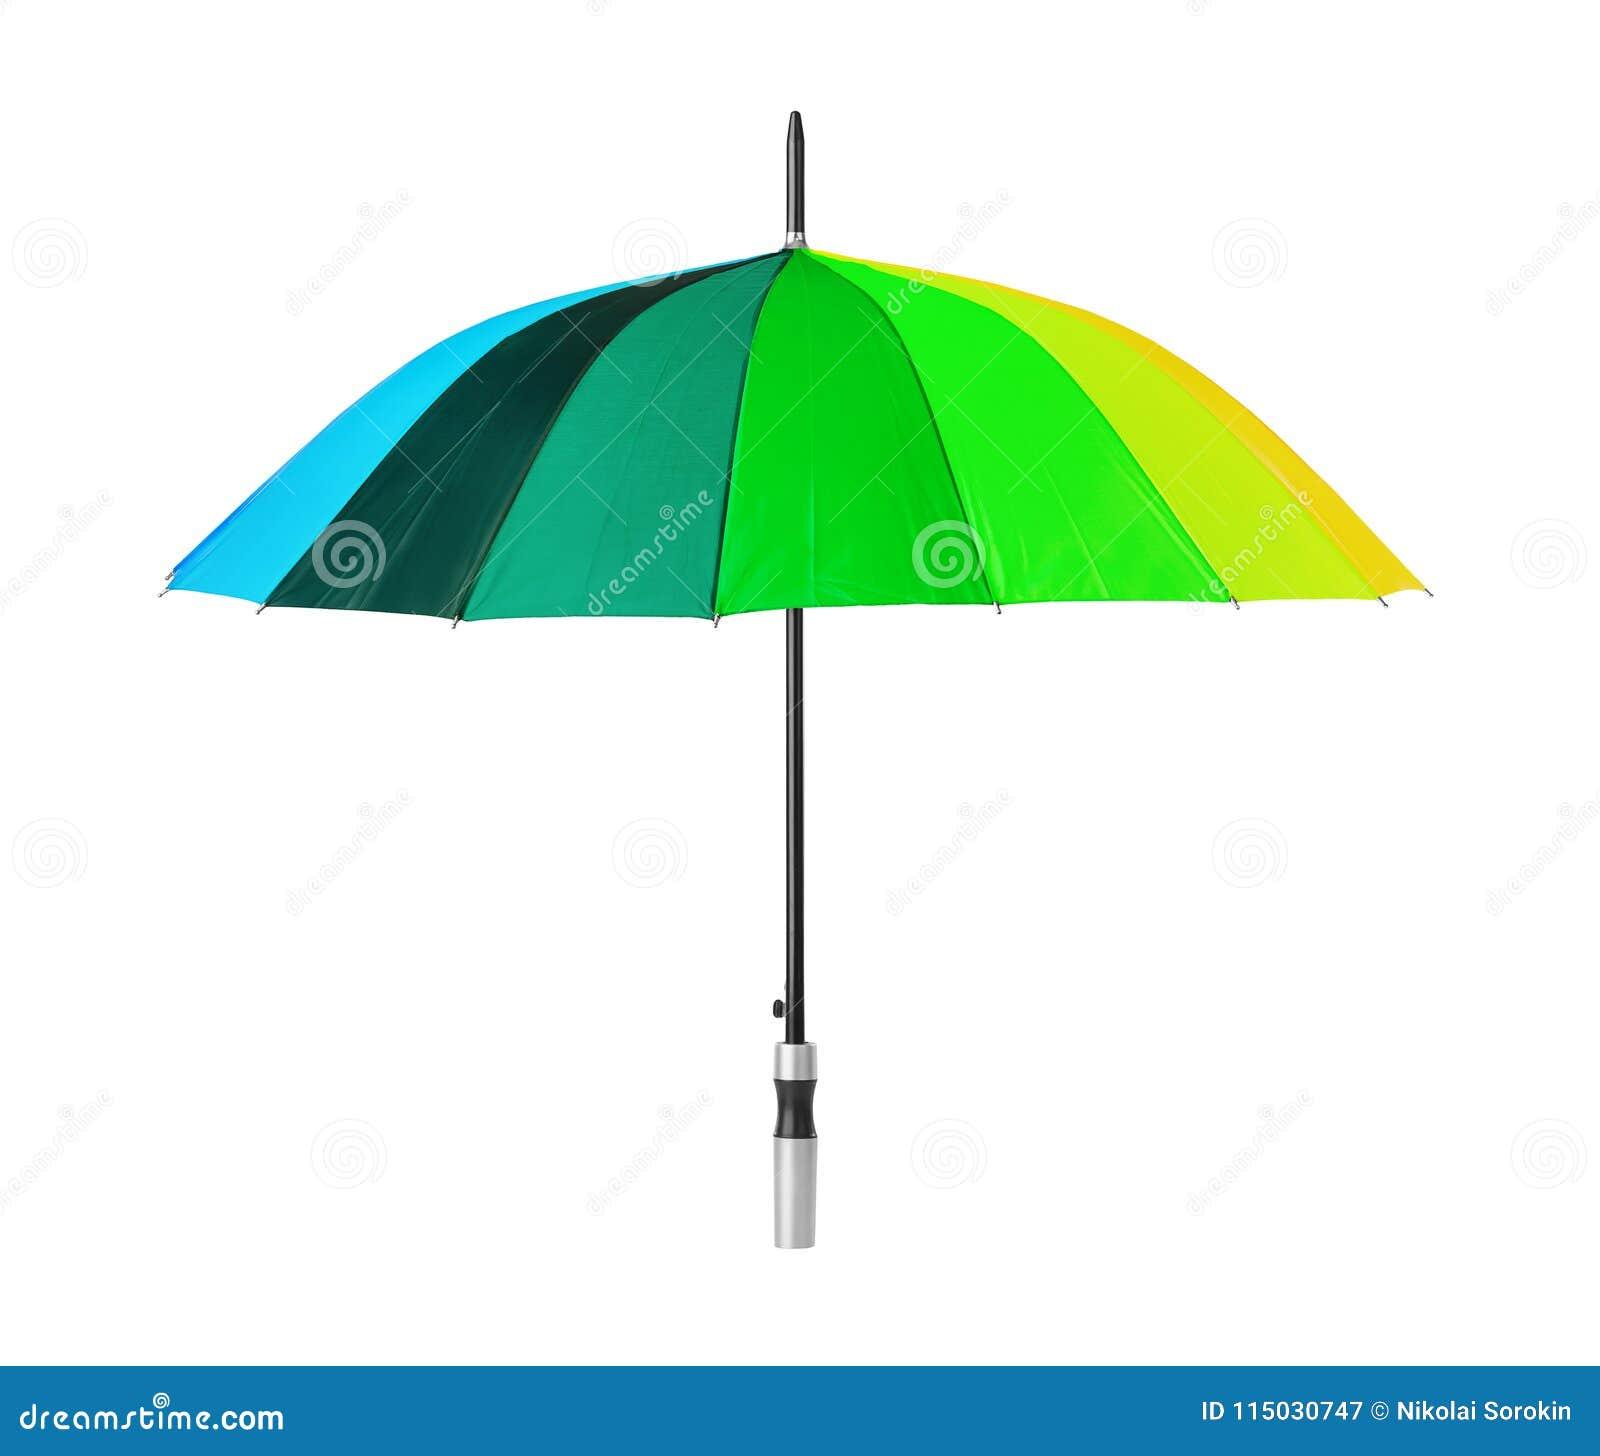 Colorful umbrella stock image. Image of canopy, nylon - 115030747